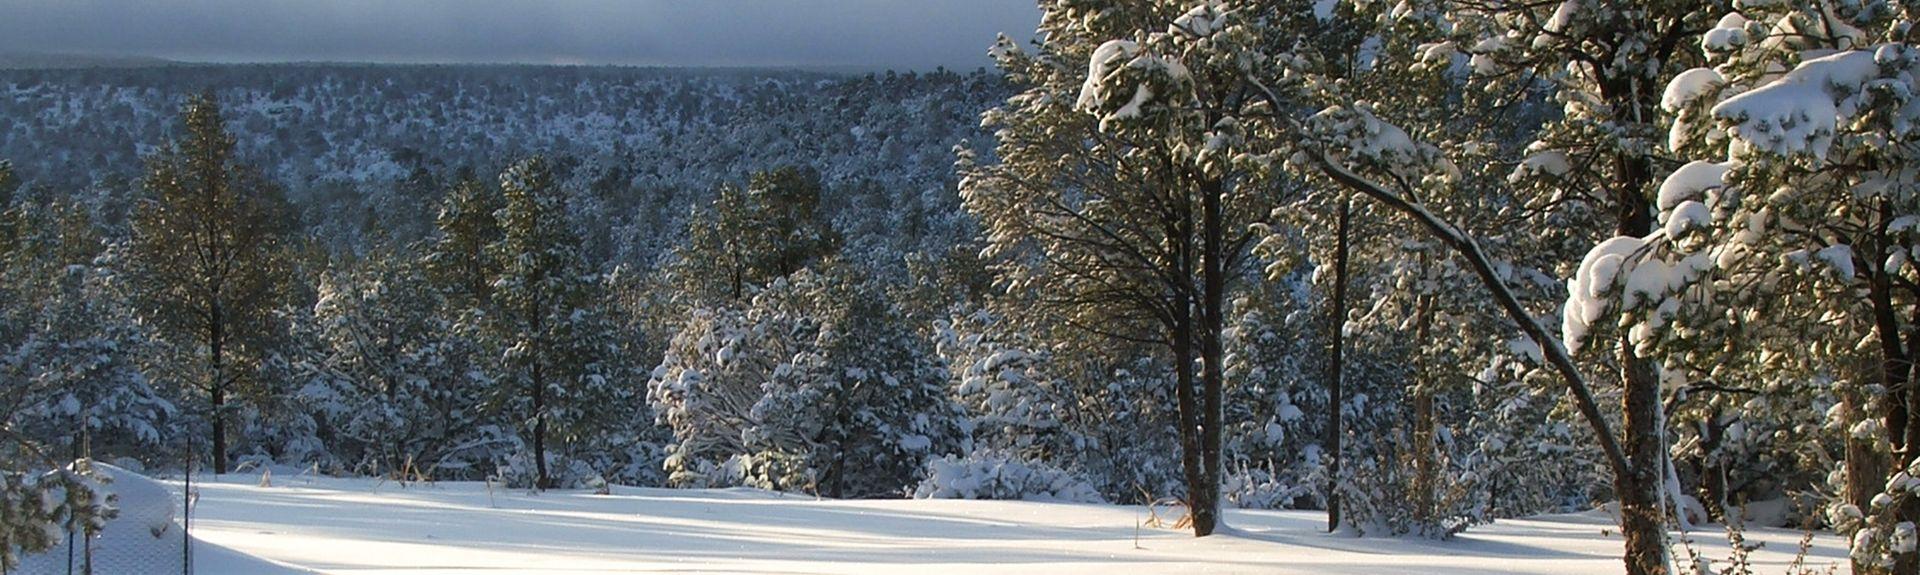 Seligman, Arizona, United States of America